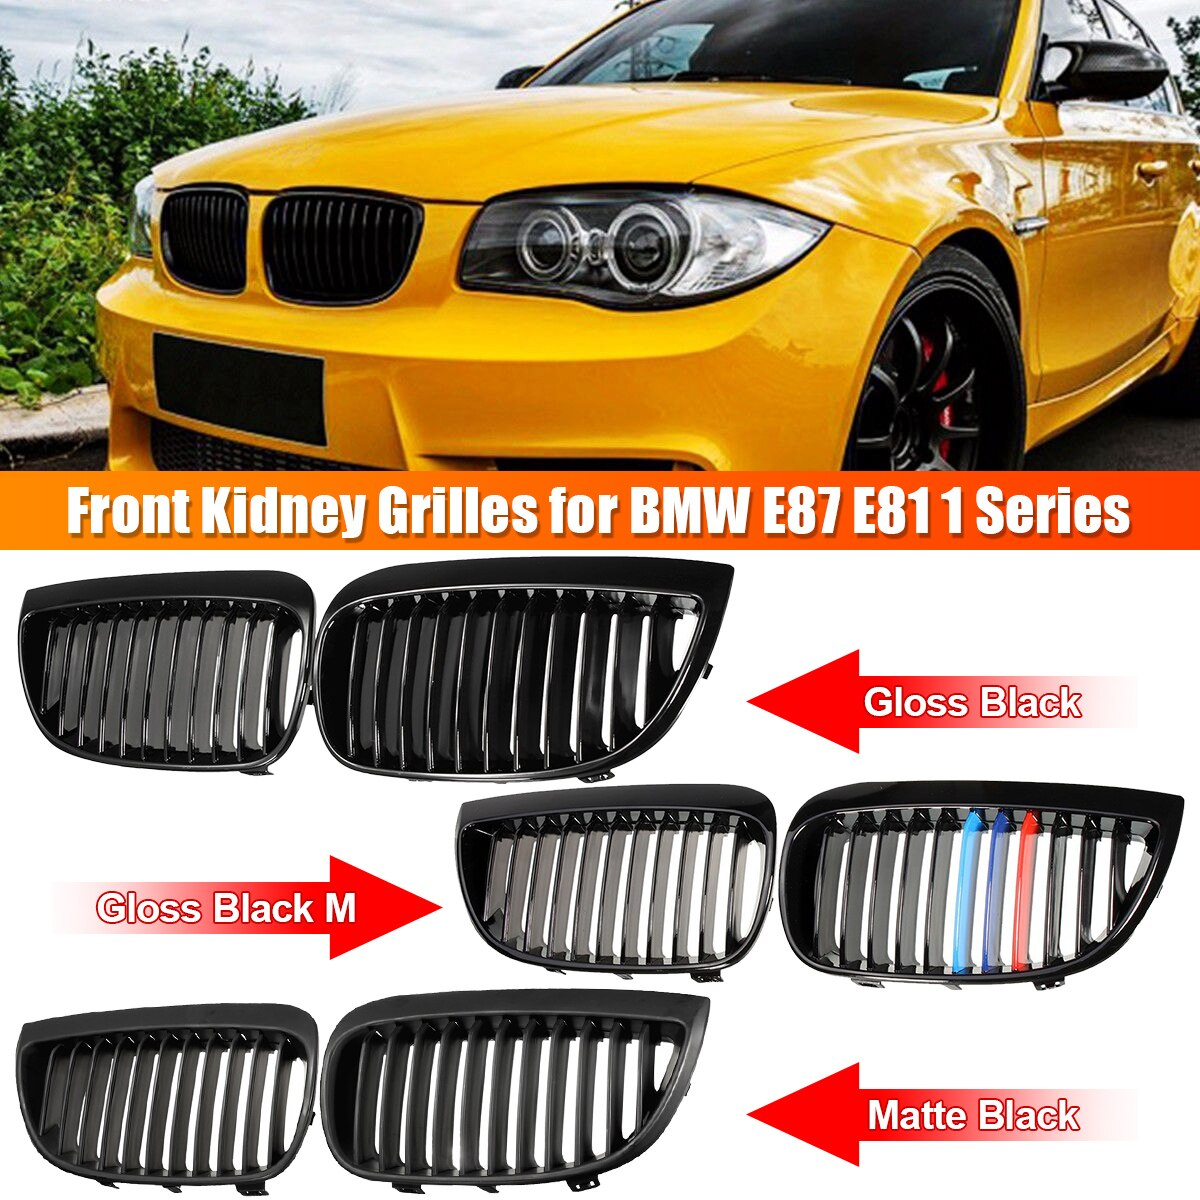 Para BMW E87 E81 1 serie 2004-2007 par izquierda y derecha coche delantero deporte riñón parrilla negro mate